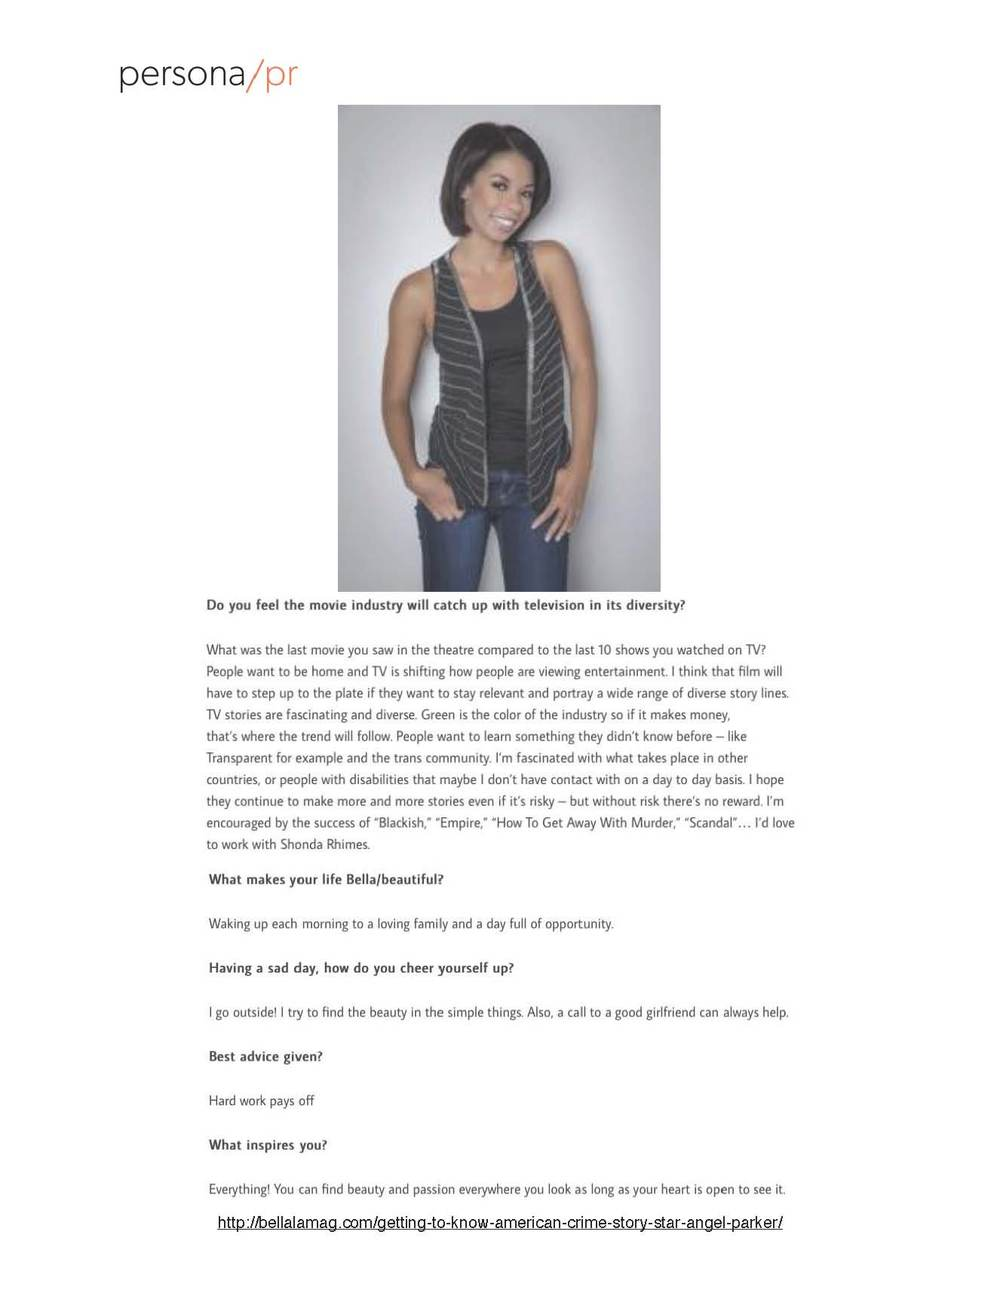 AngelParker-BELLA[LA]-03.09.16_Page_4.jpg